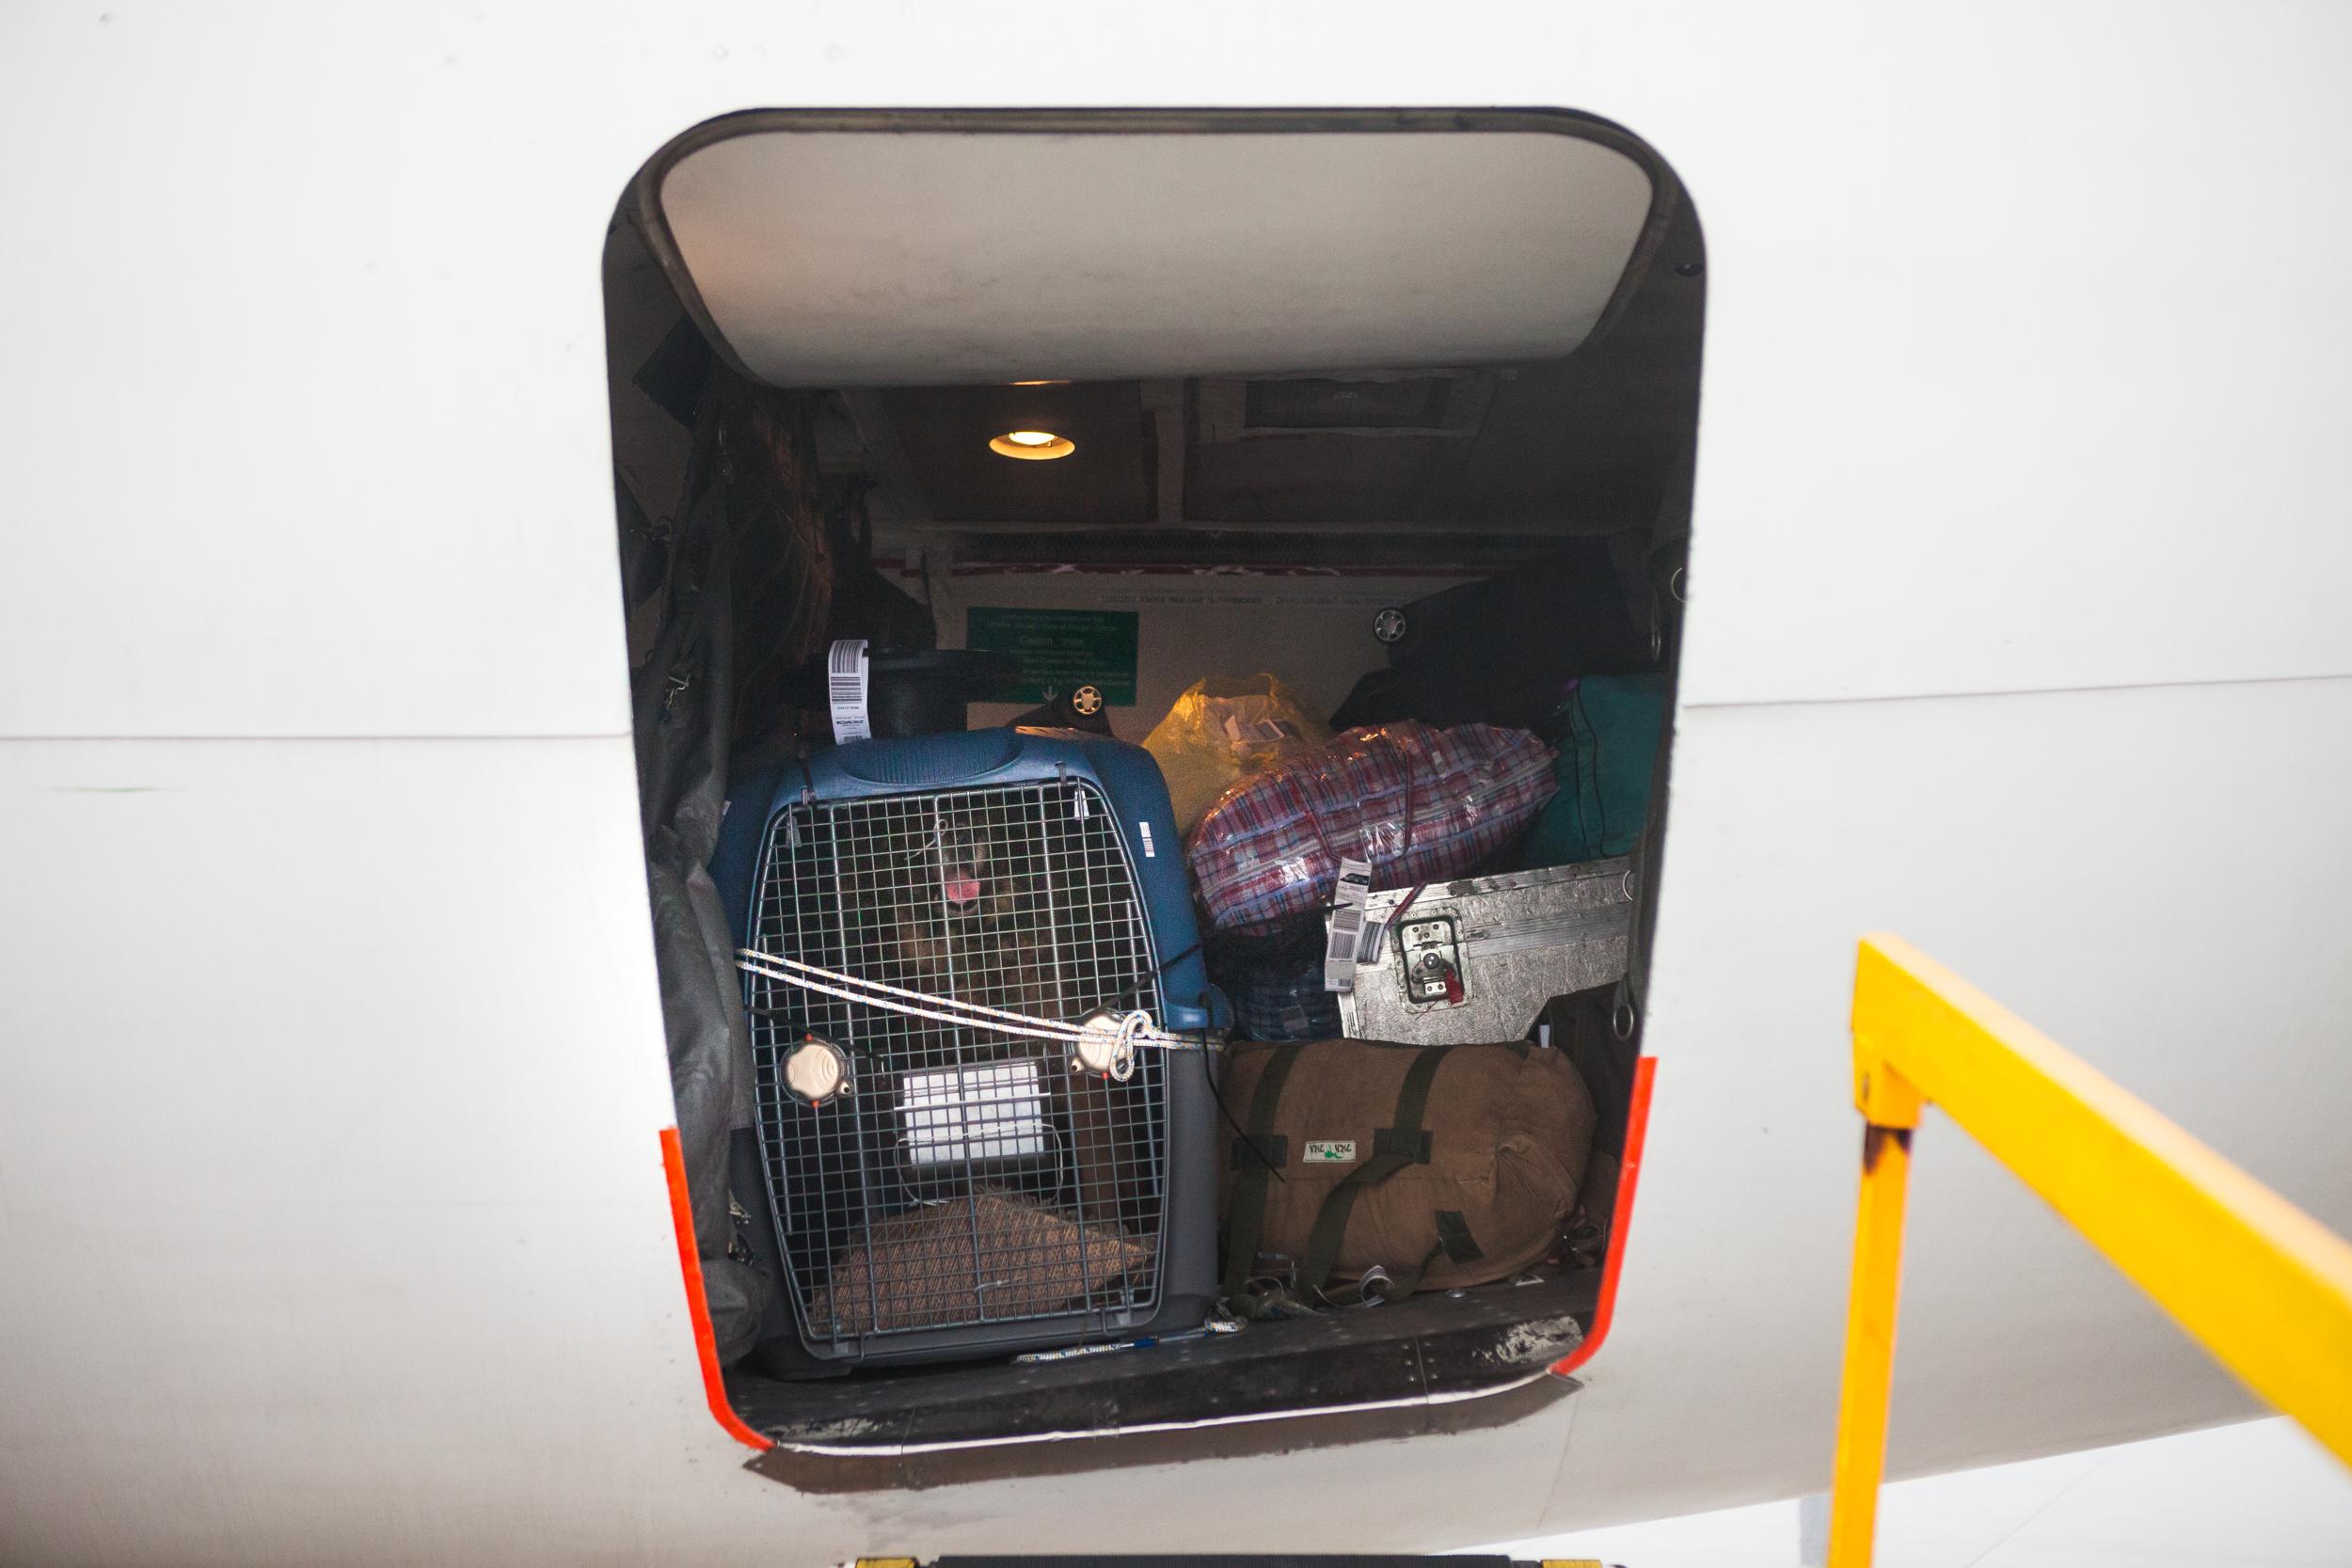 shlomi-amiga-dogs-in-cages-7.jpg